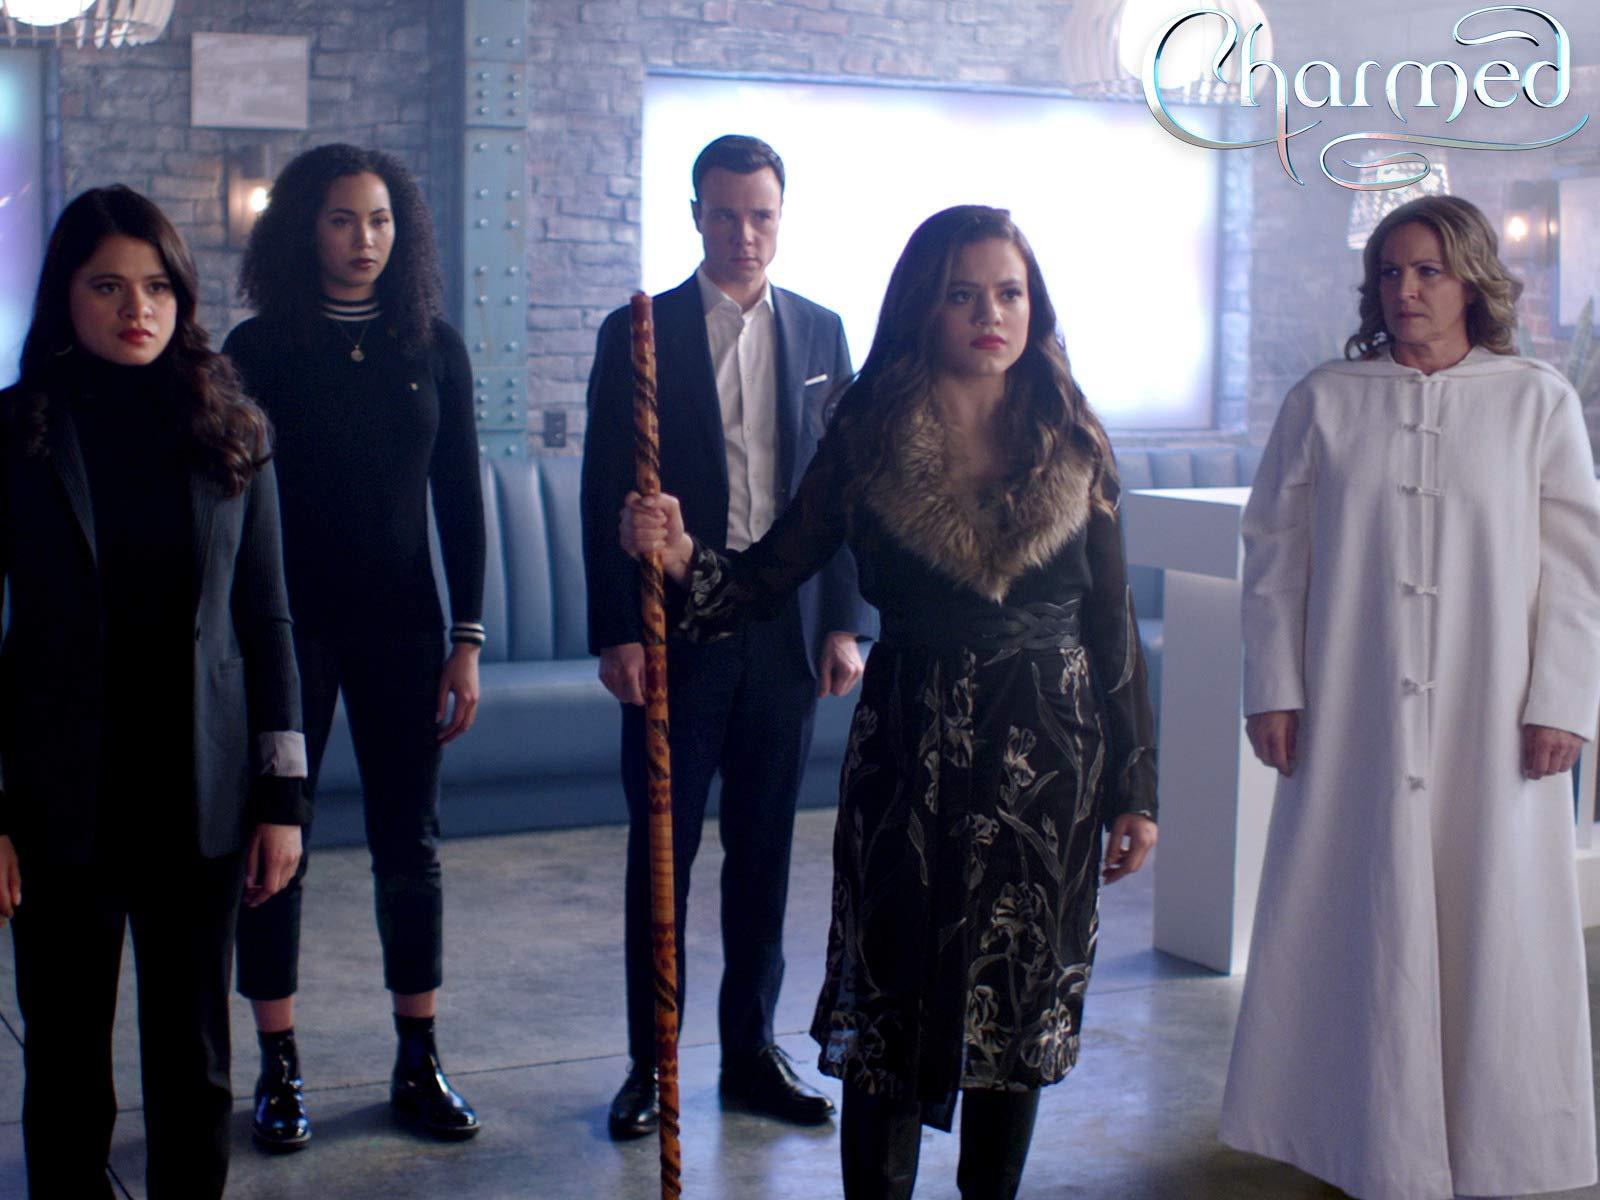 Amazon com: Watch Charmed, Season 1 | Prime Video